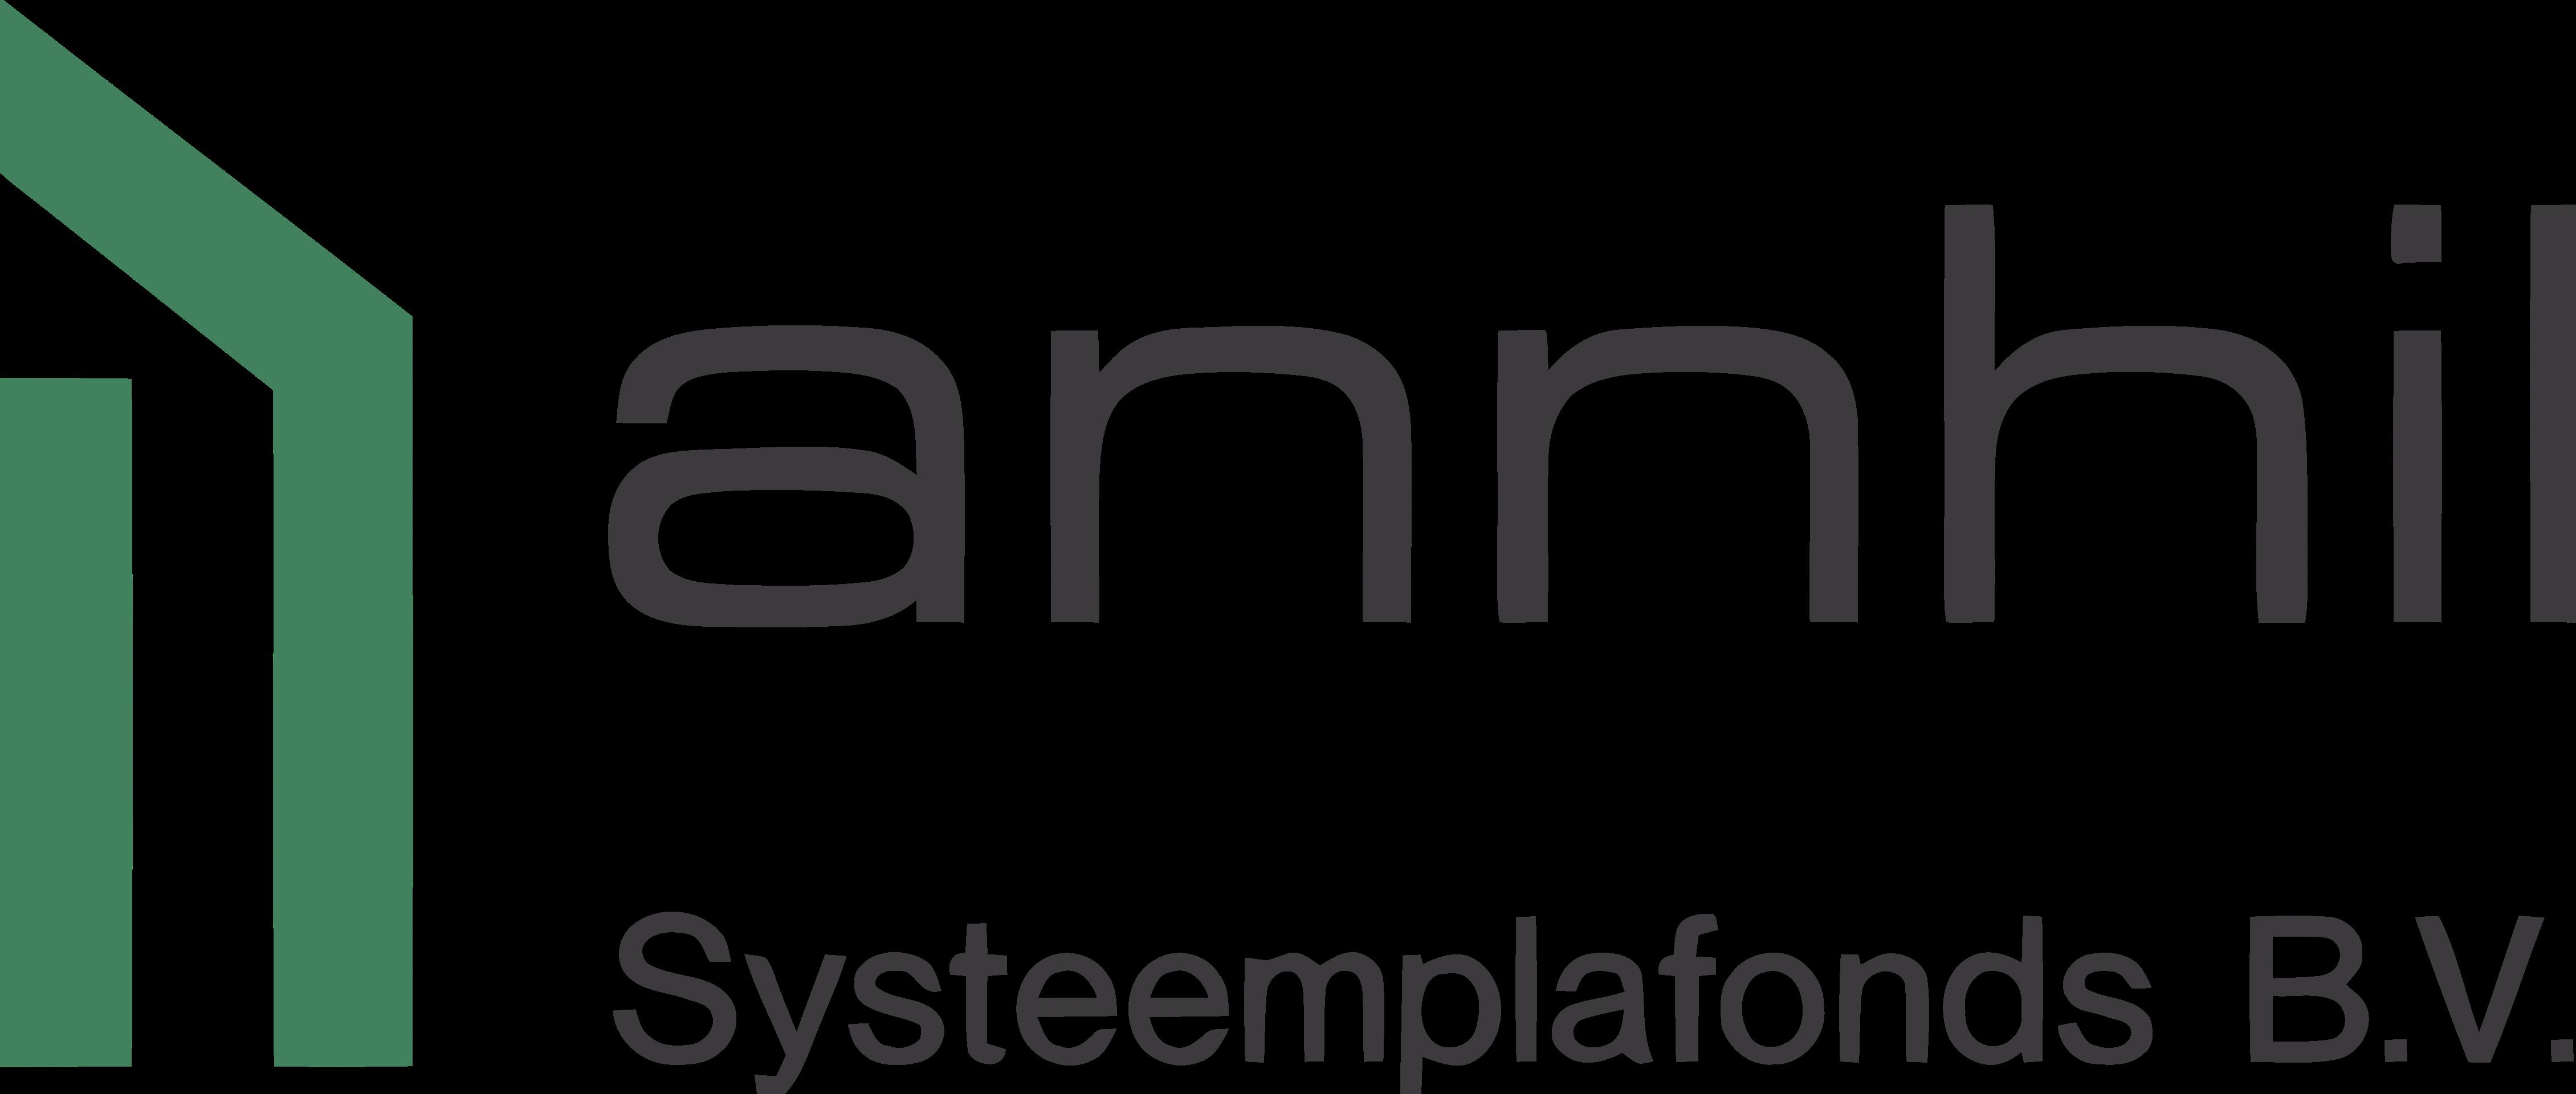 Annhil Systeemplafonds BV Hoogeveen